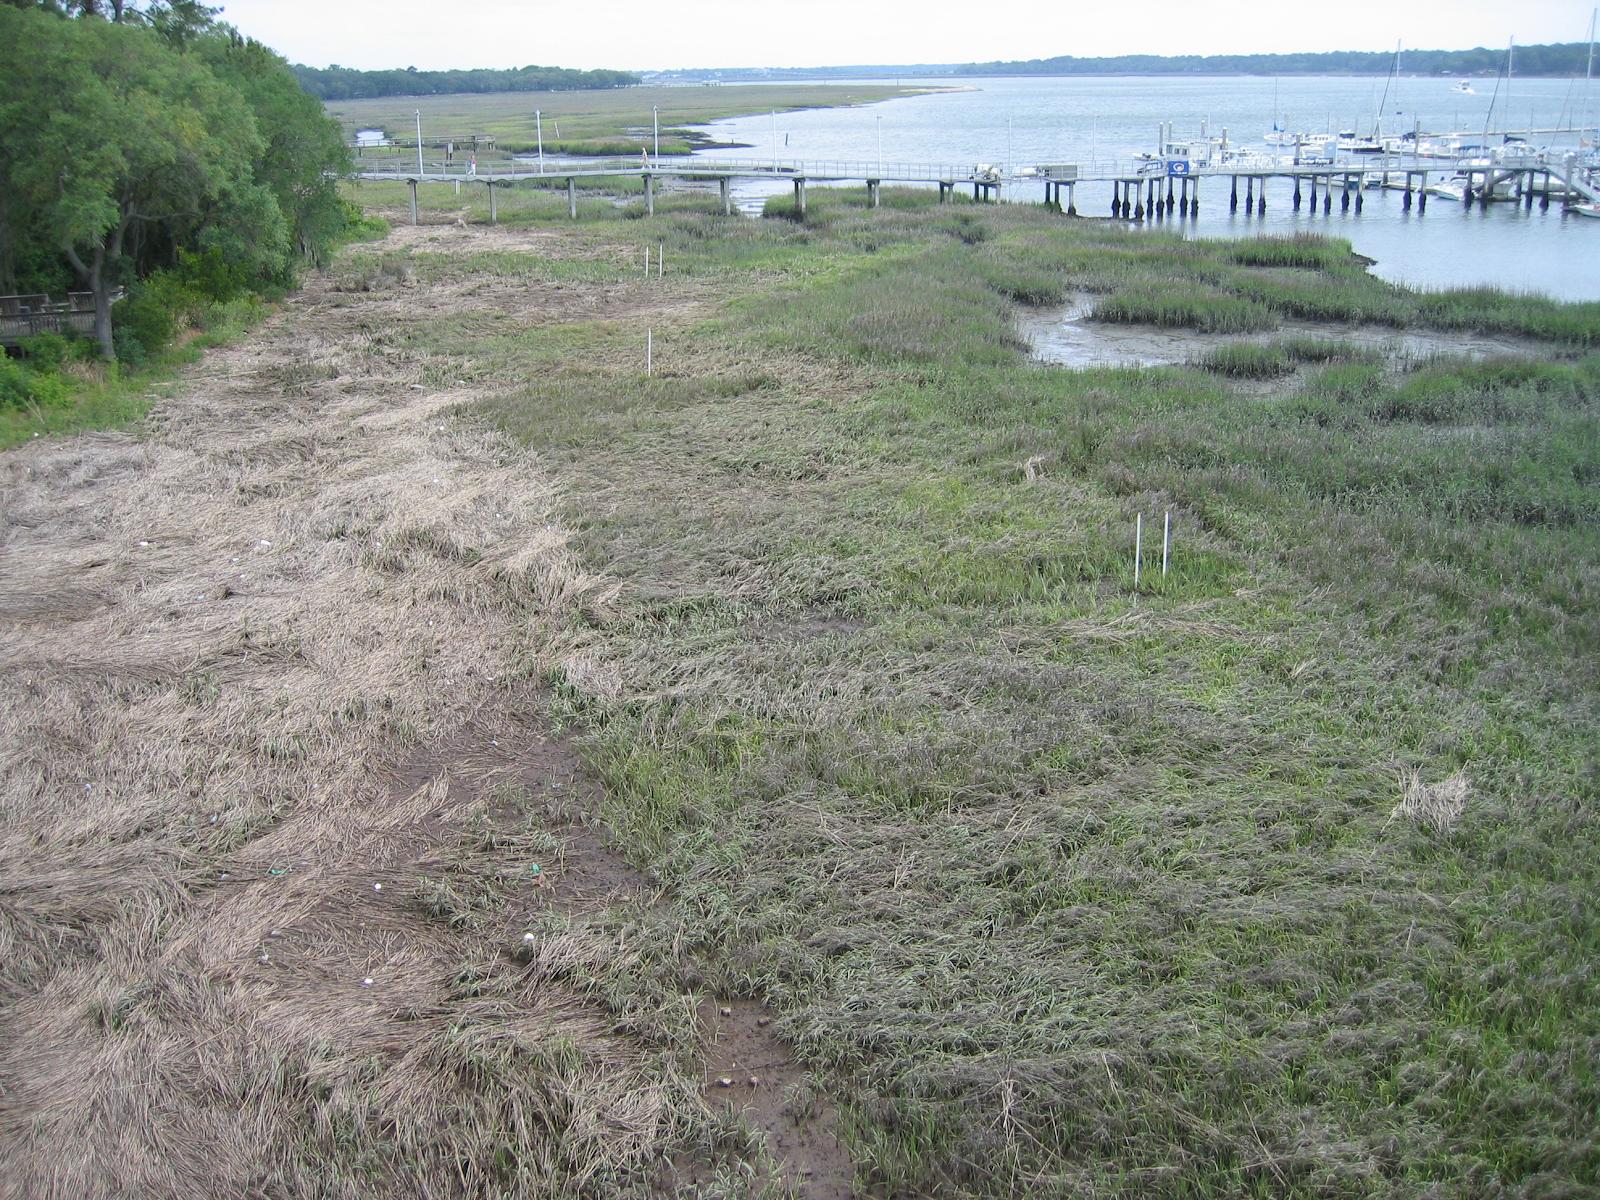 View of saltmarsh on edge of water at Port of Baldwin Mines, South Carolina.